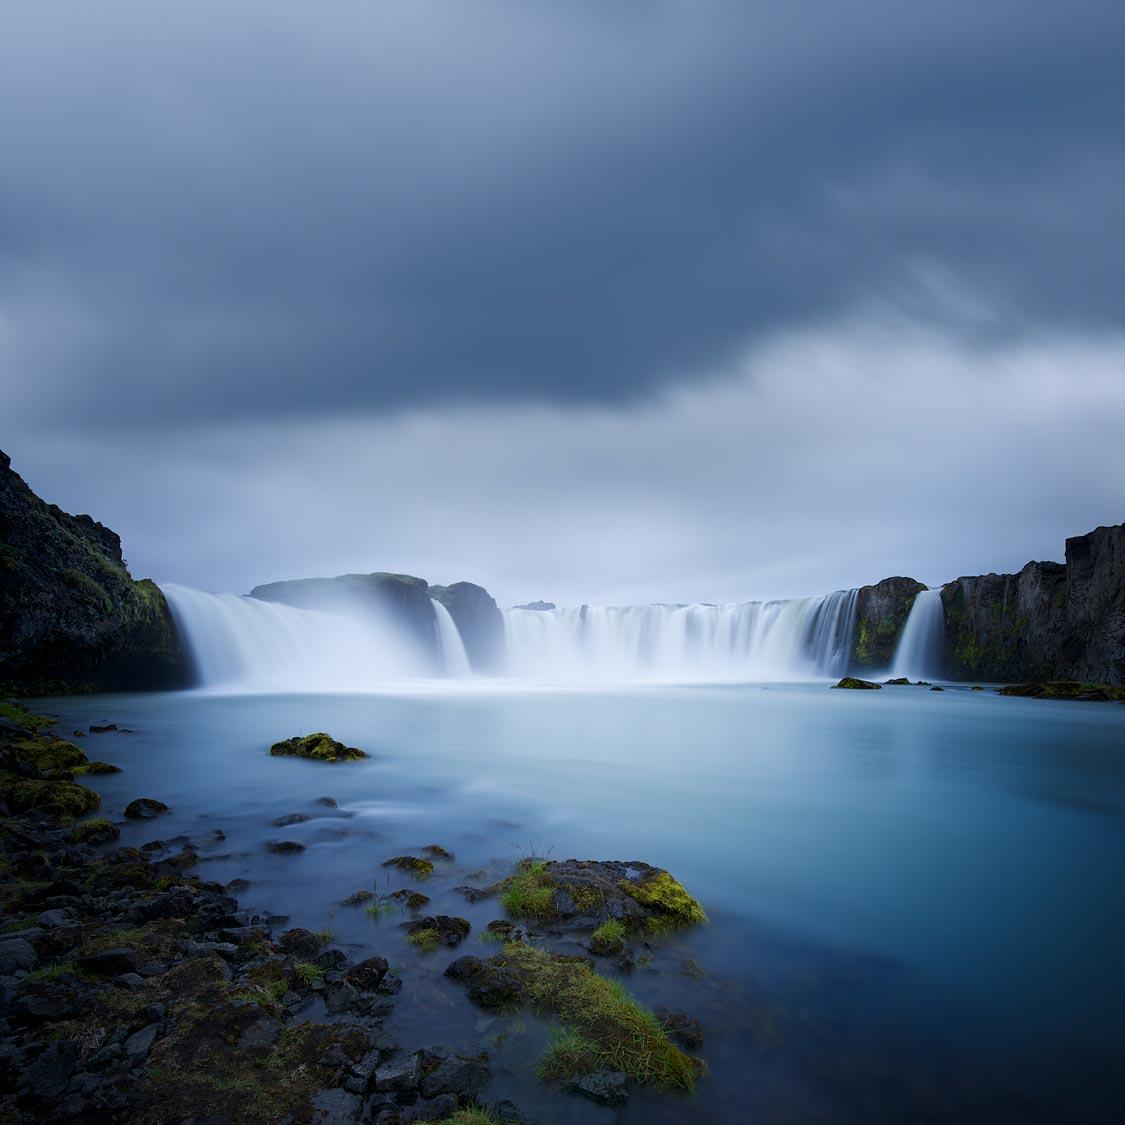 Jérôme Berbigier - Iceland - Godafoss-Sacred-Water-1125px50